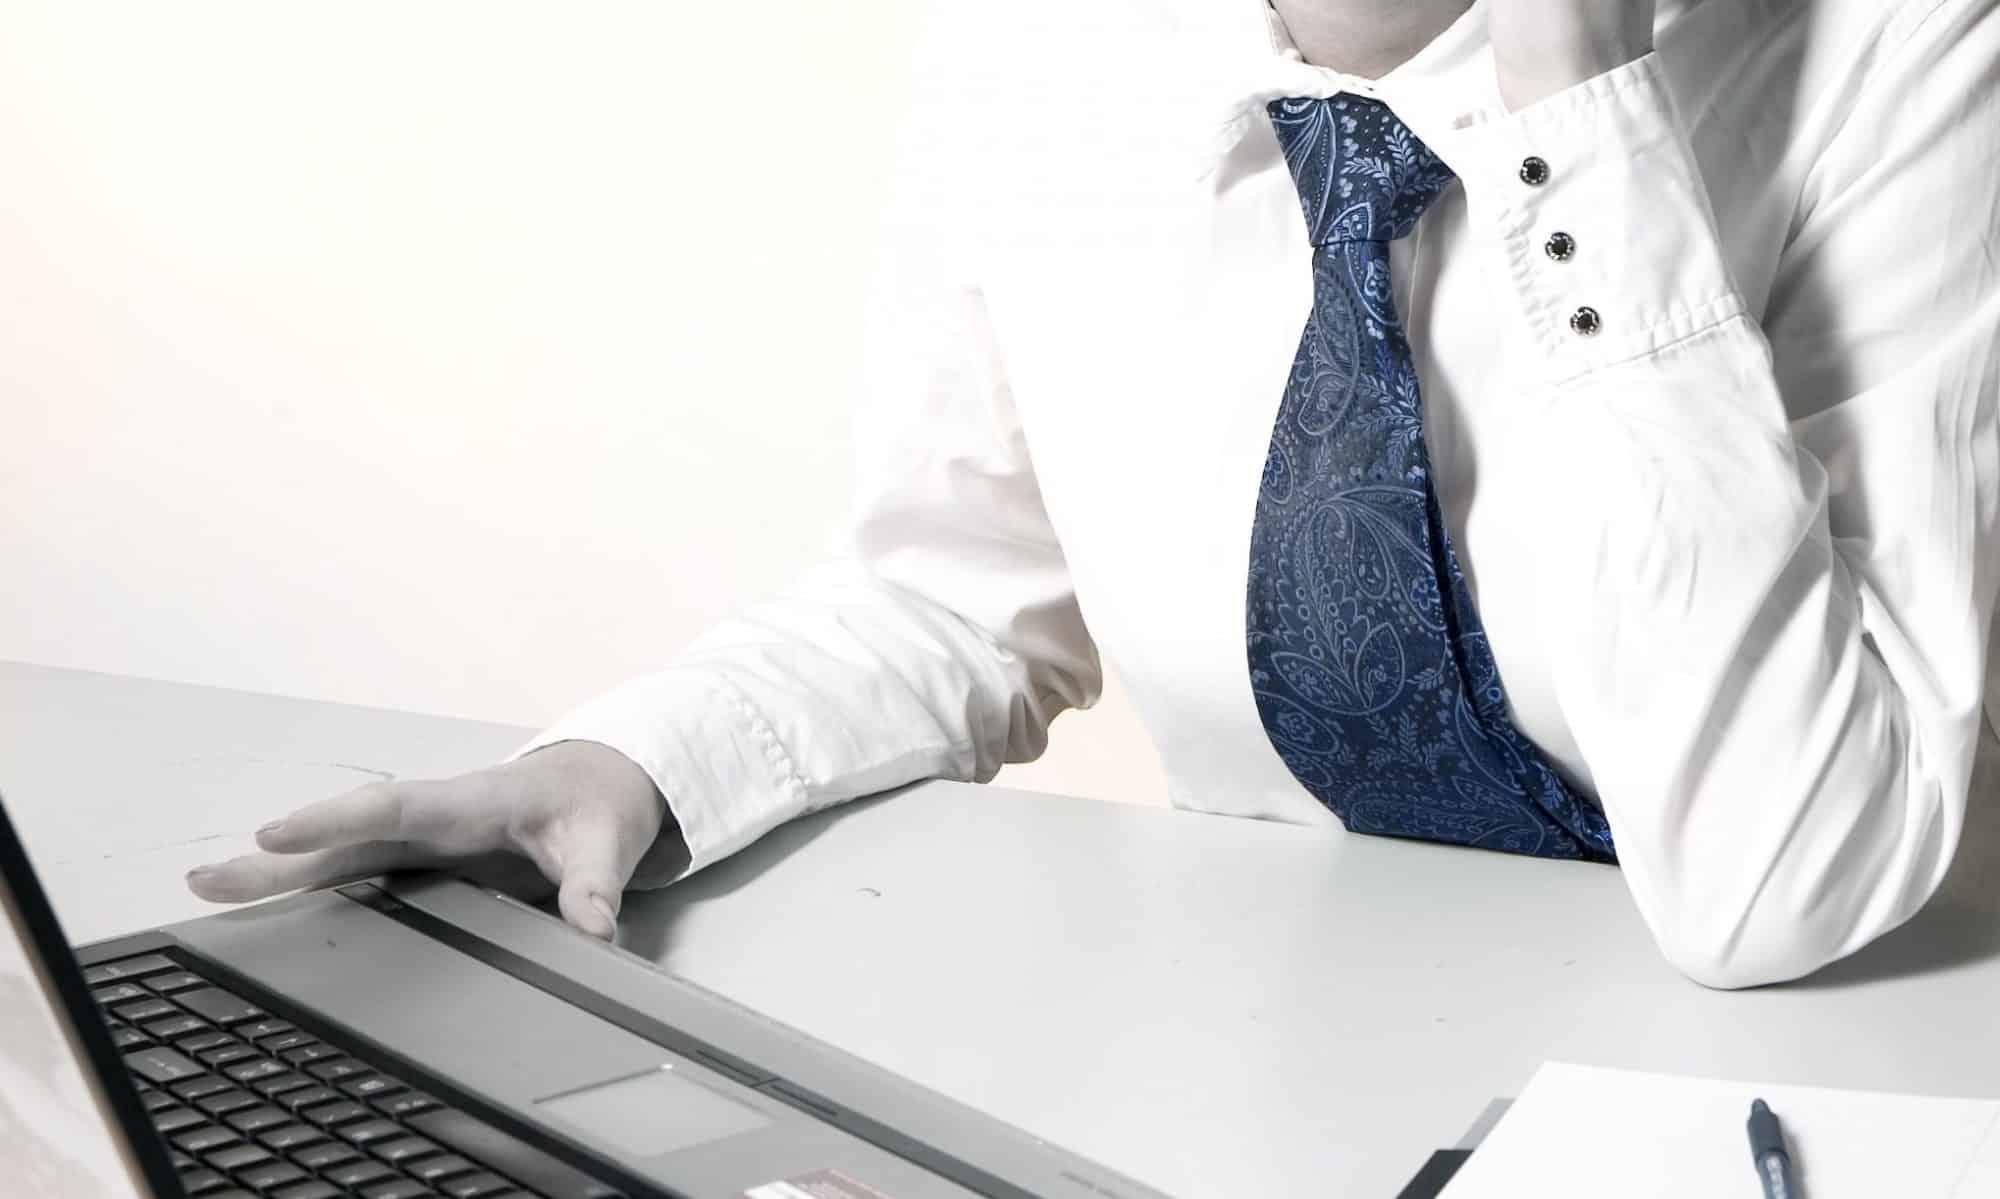 Audit Services sp. z o.o. - Biuro rachunkowe